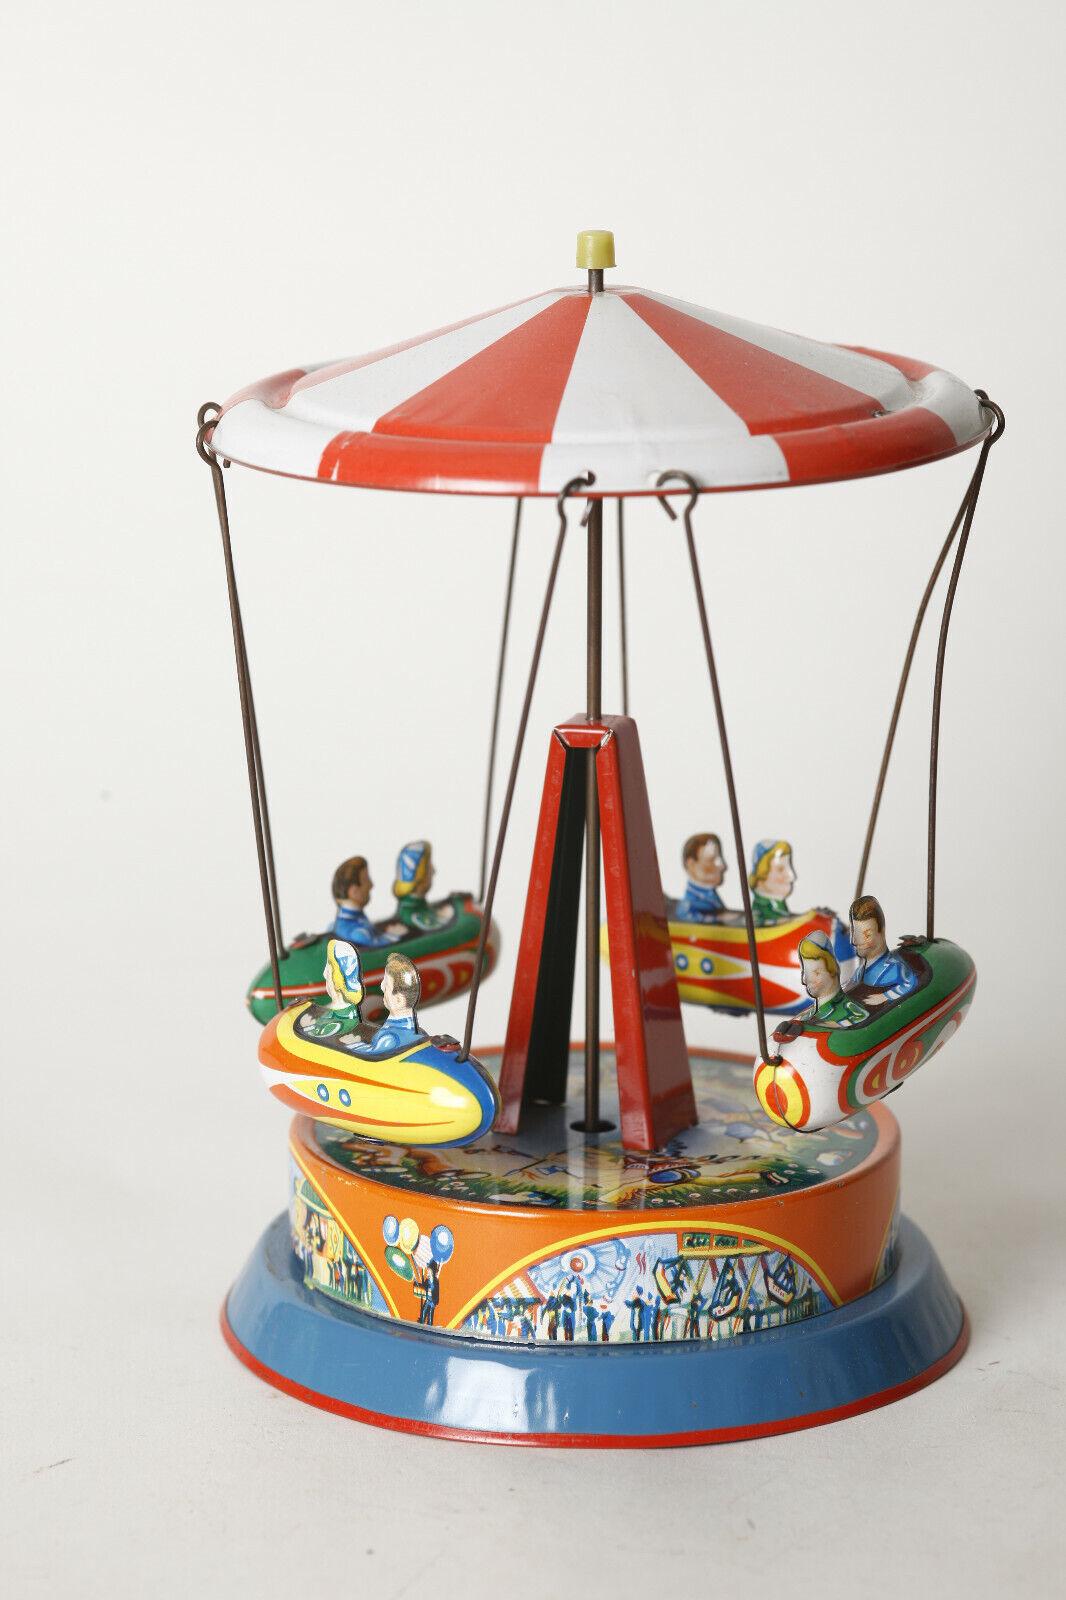 Tin Toy   Fair Ketten-Karussell Von B&S Jumbo, West-Germany (109941)